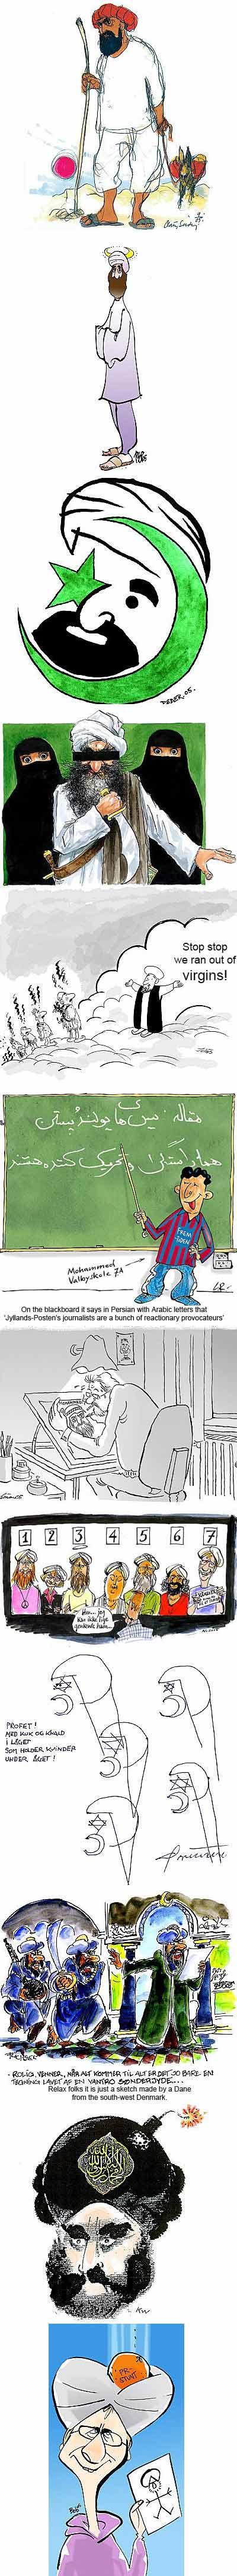 Mo Cartoons